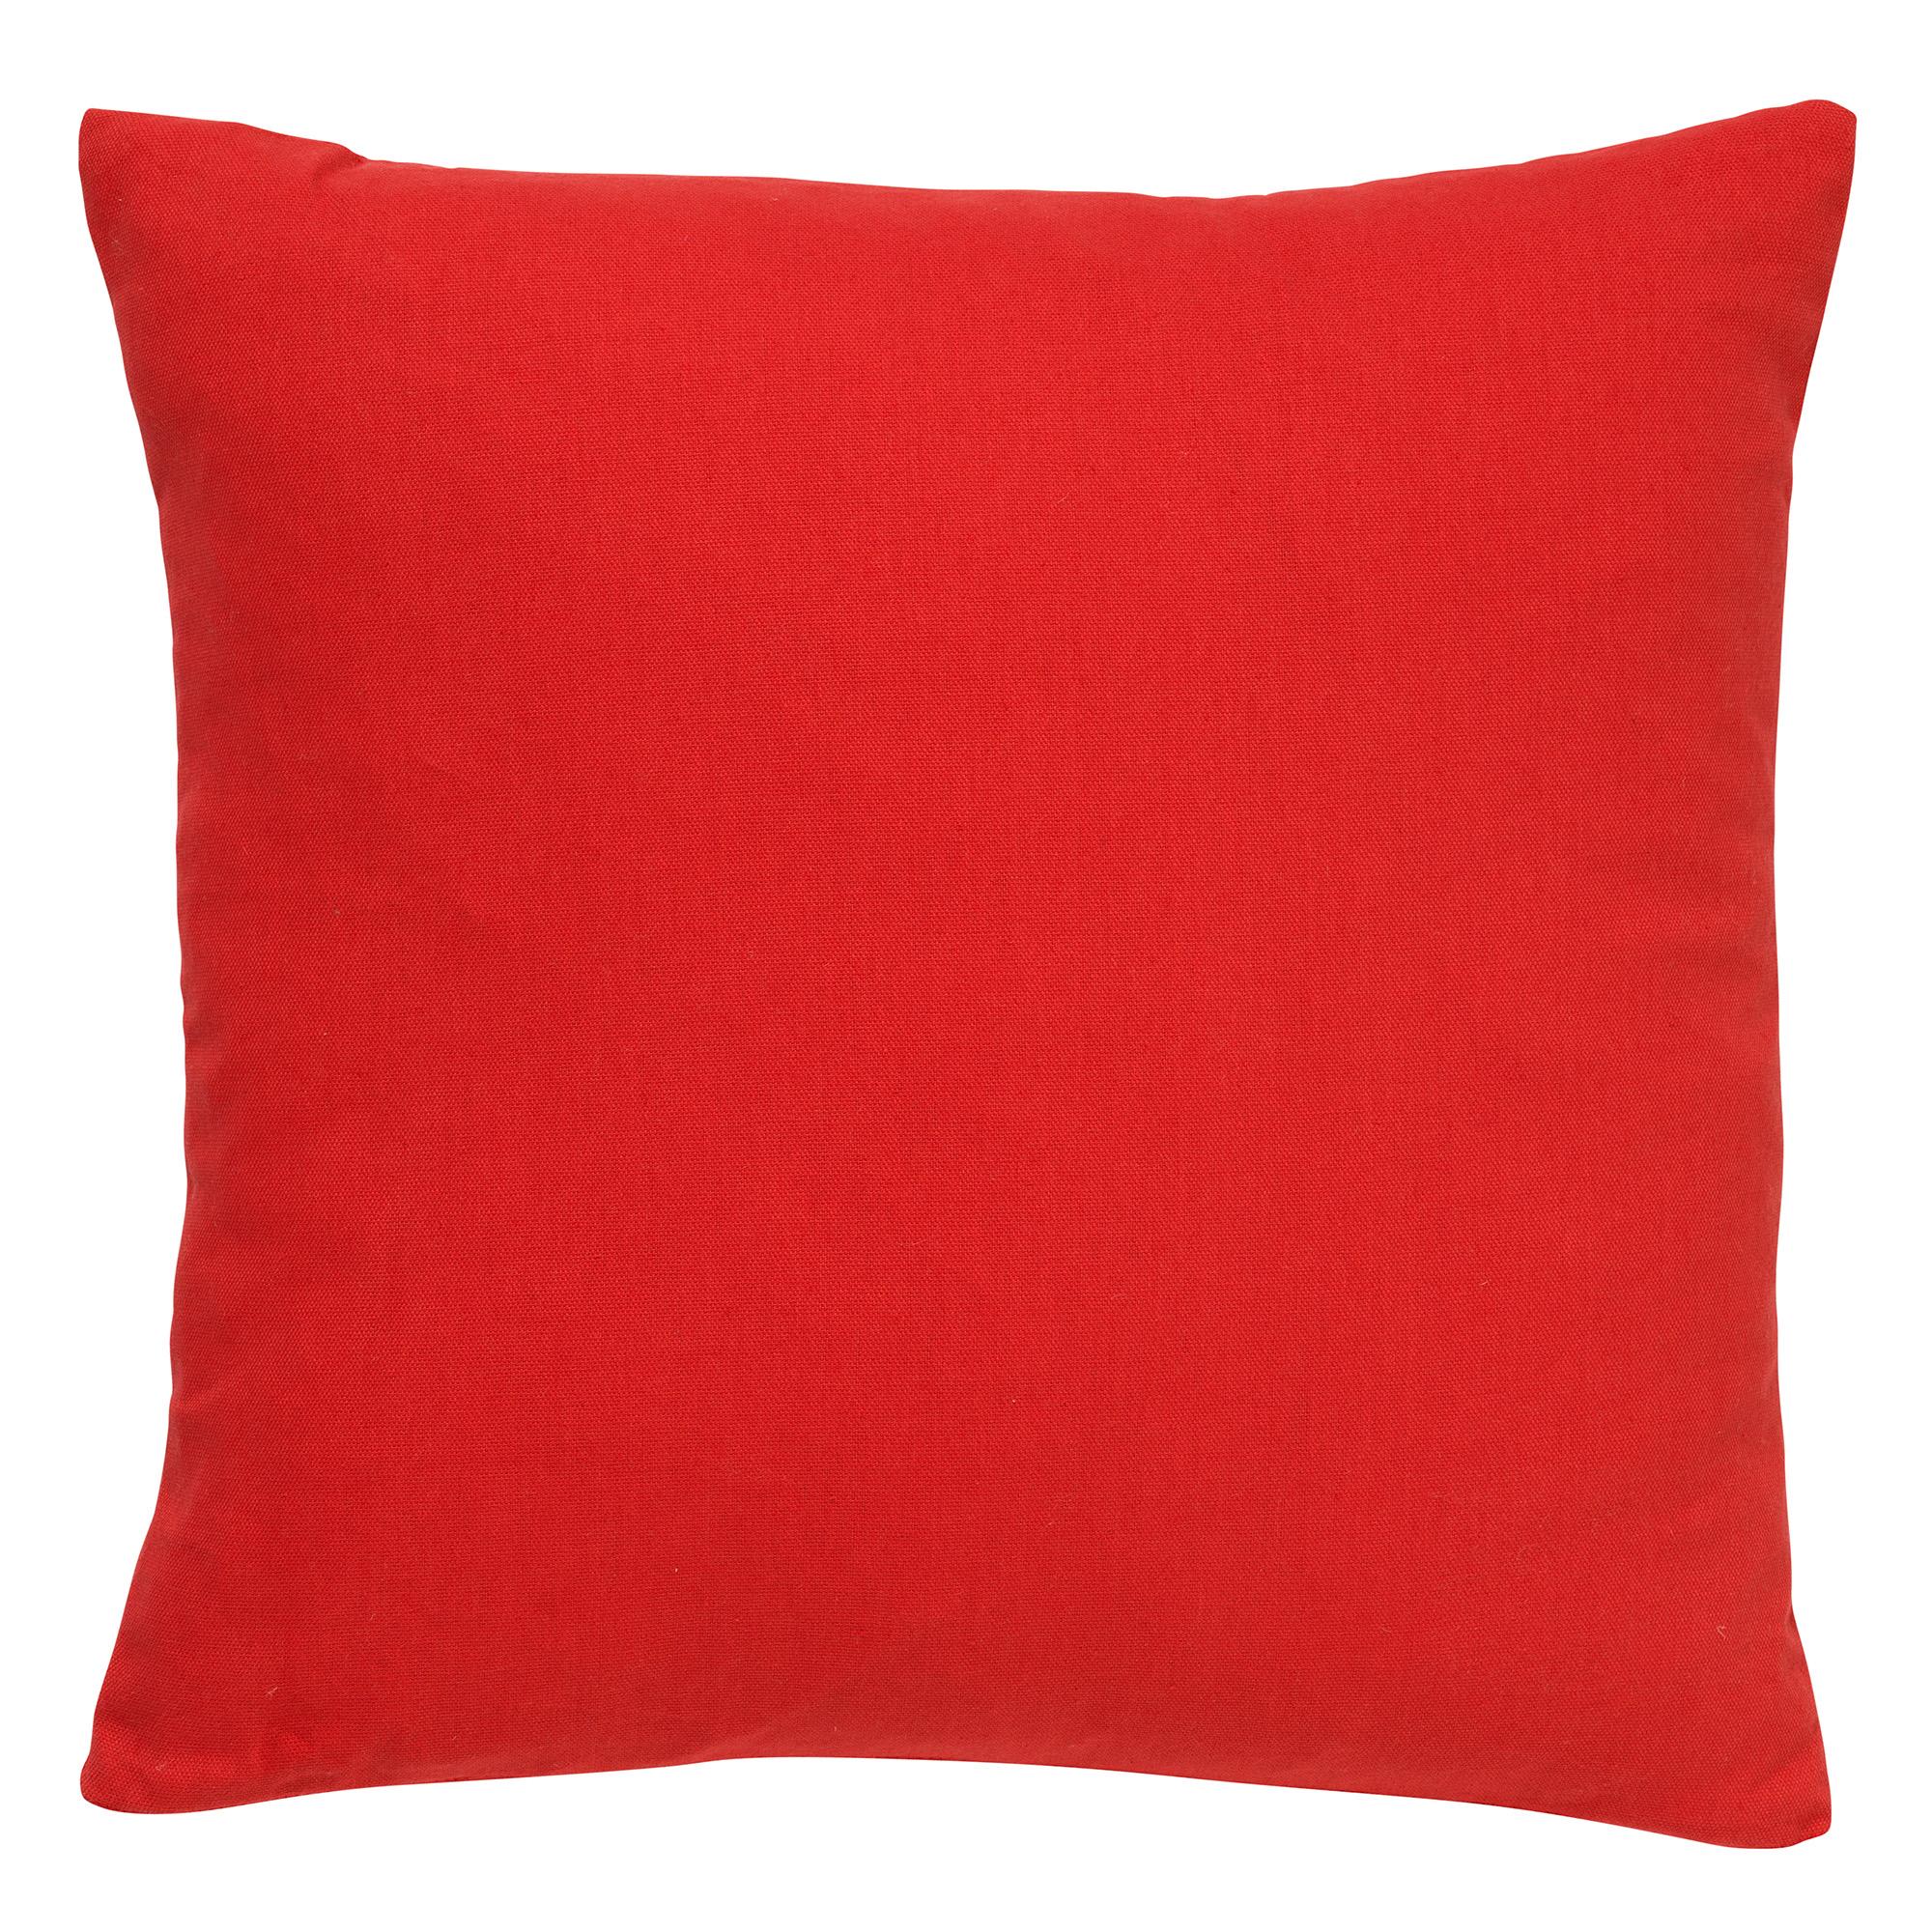 JAMES - Sierkussen van katoen Aurora Red 45x45 cm